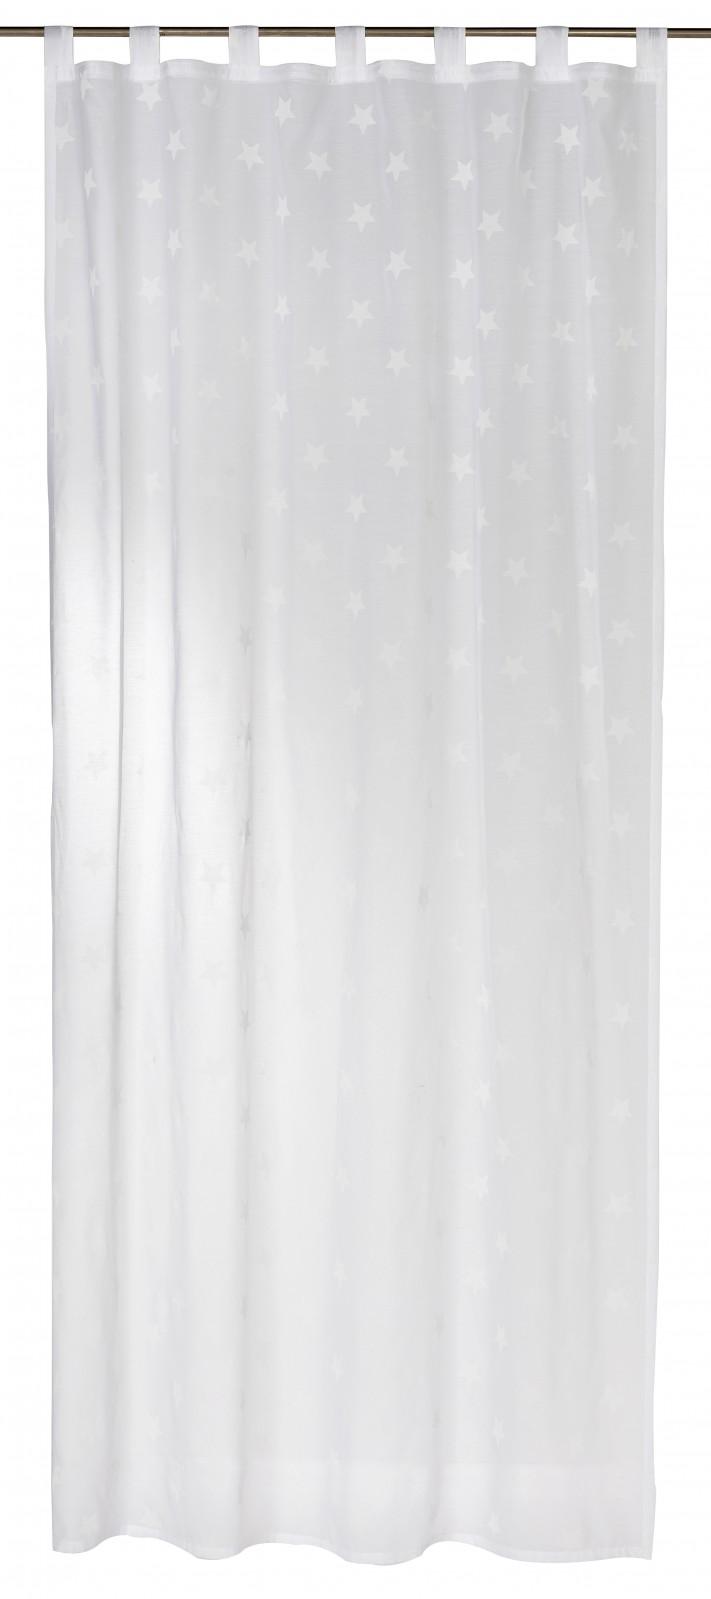 schlaufenschal wei halbtransparent 140x255cm 197476. Black Bedroom Furniture Sets. Home Design Ideas